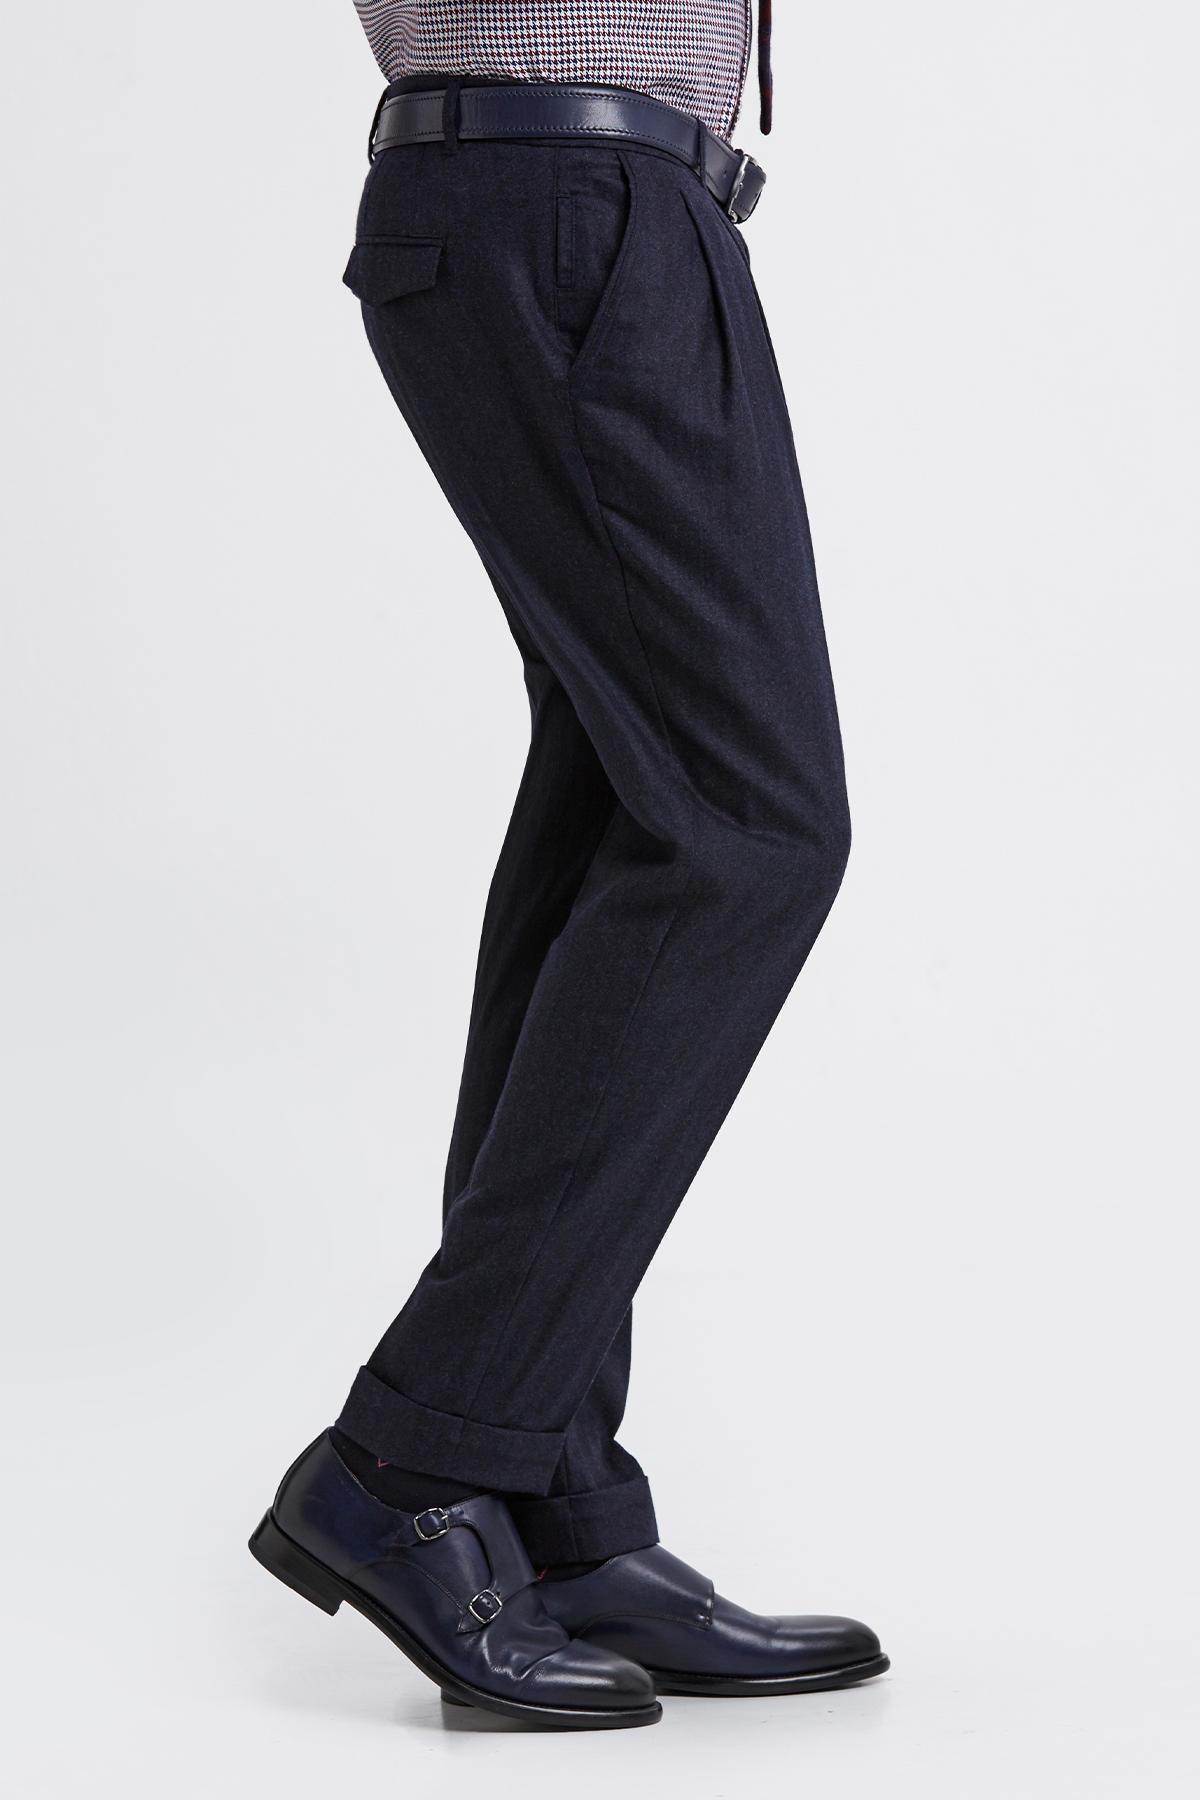 Yün Kaşmir Lacivert Chino Pantolon